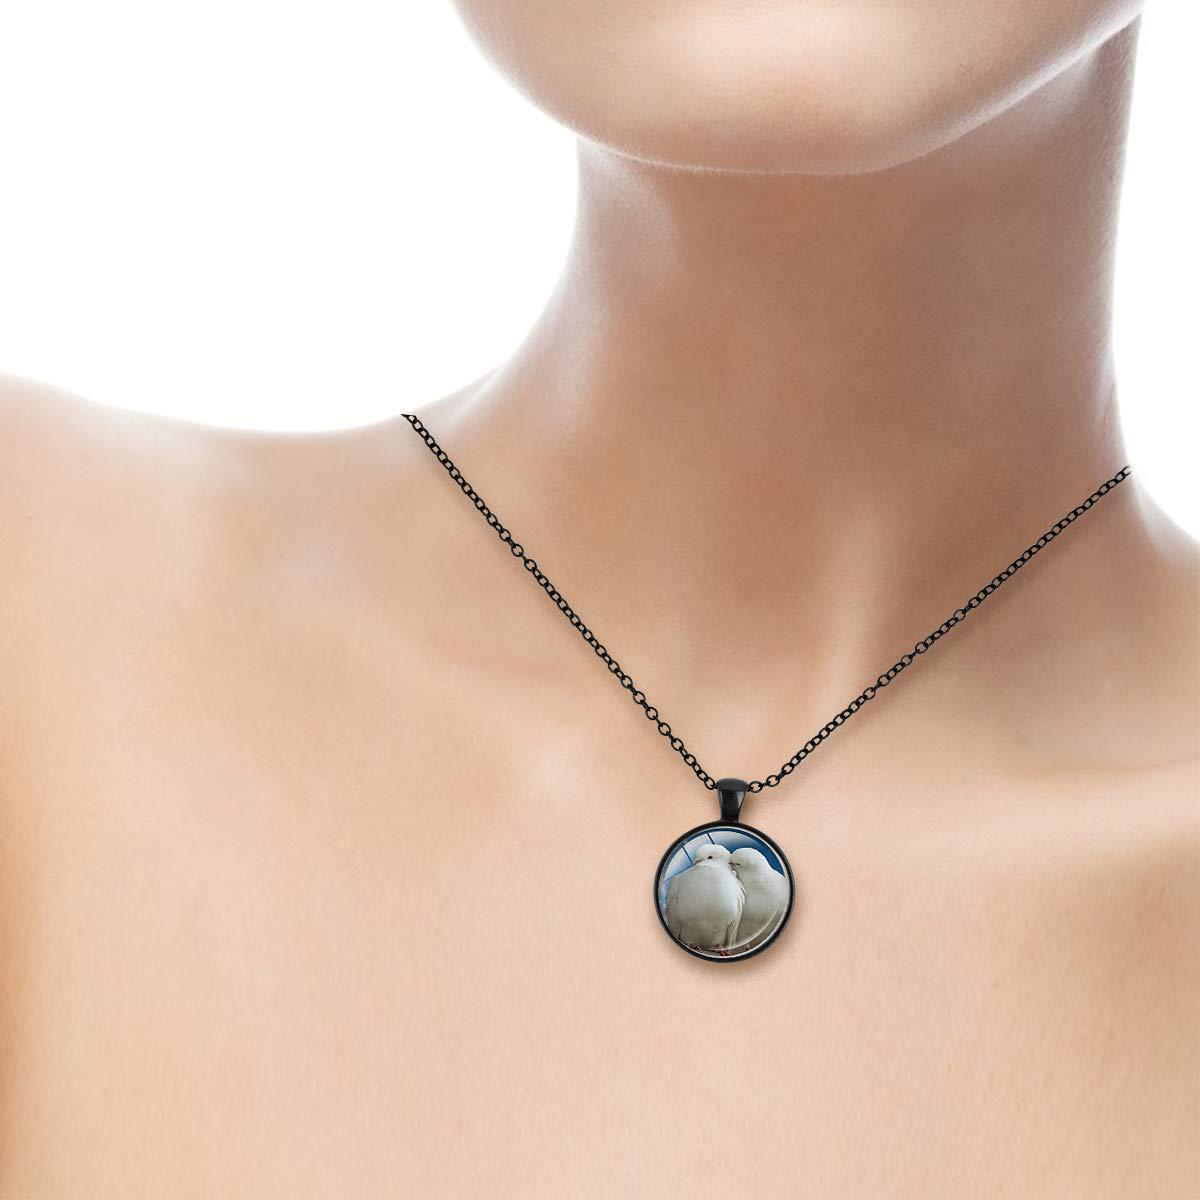 Family Decor White Doves Peace Dove Pendant Necklace Cabochon Glass Vintage Bronze Chain Necklace Jewelry Handmade